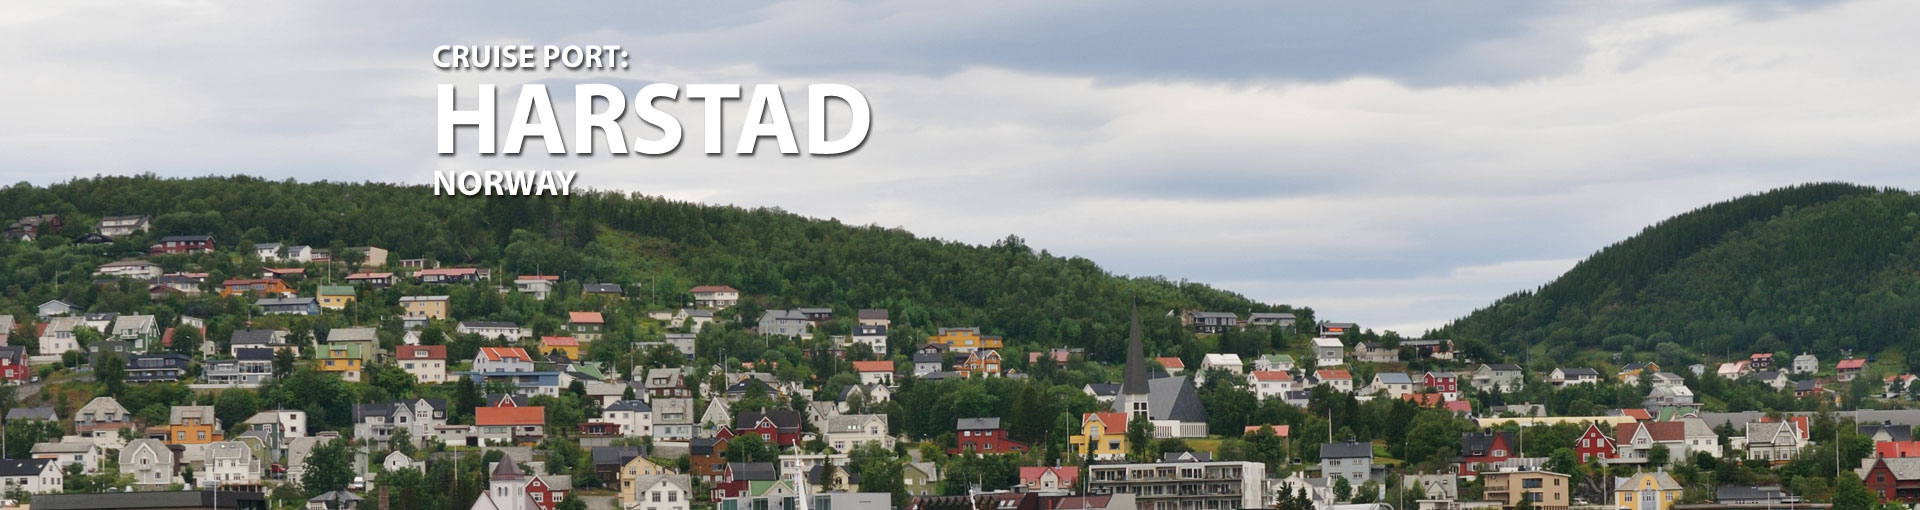 Cruises to Harstad, Norway